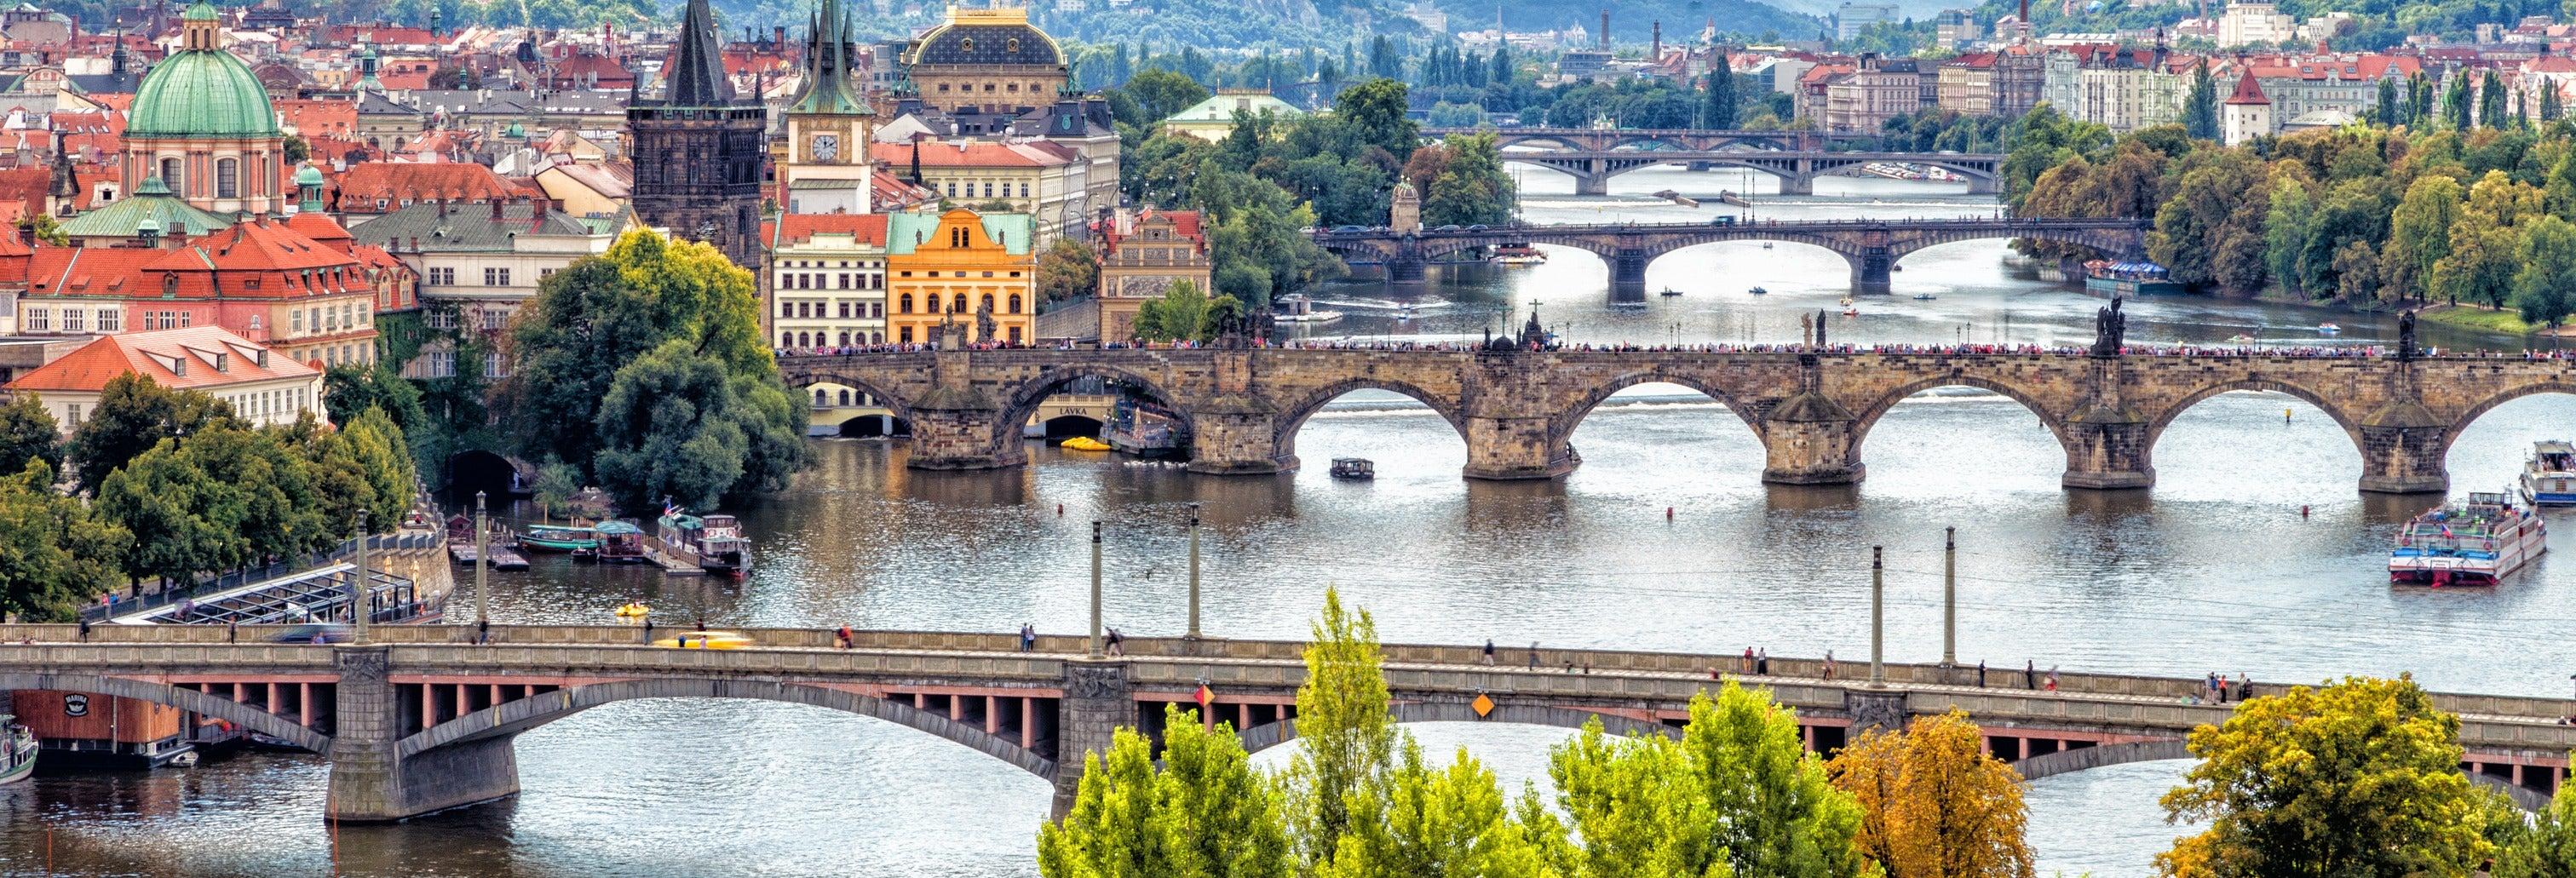 Tour de 4 días por Bratislava, Praga y Viena